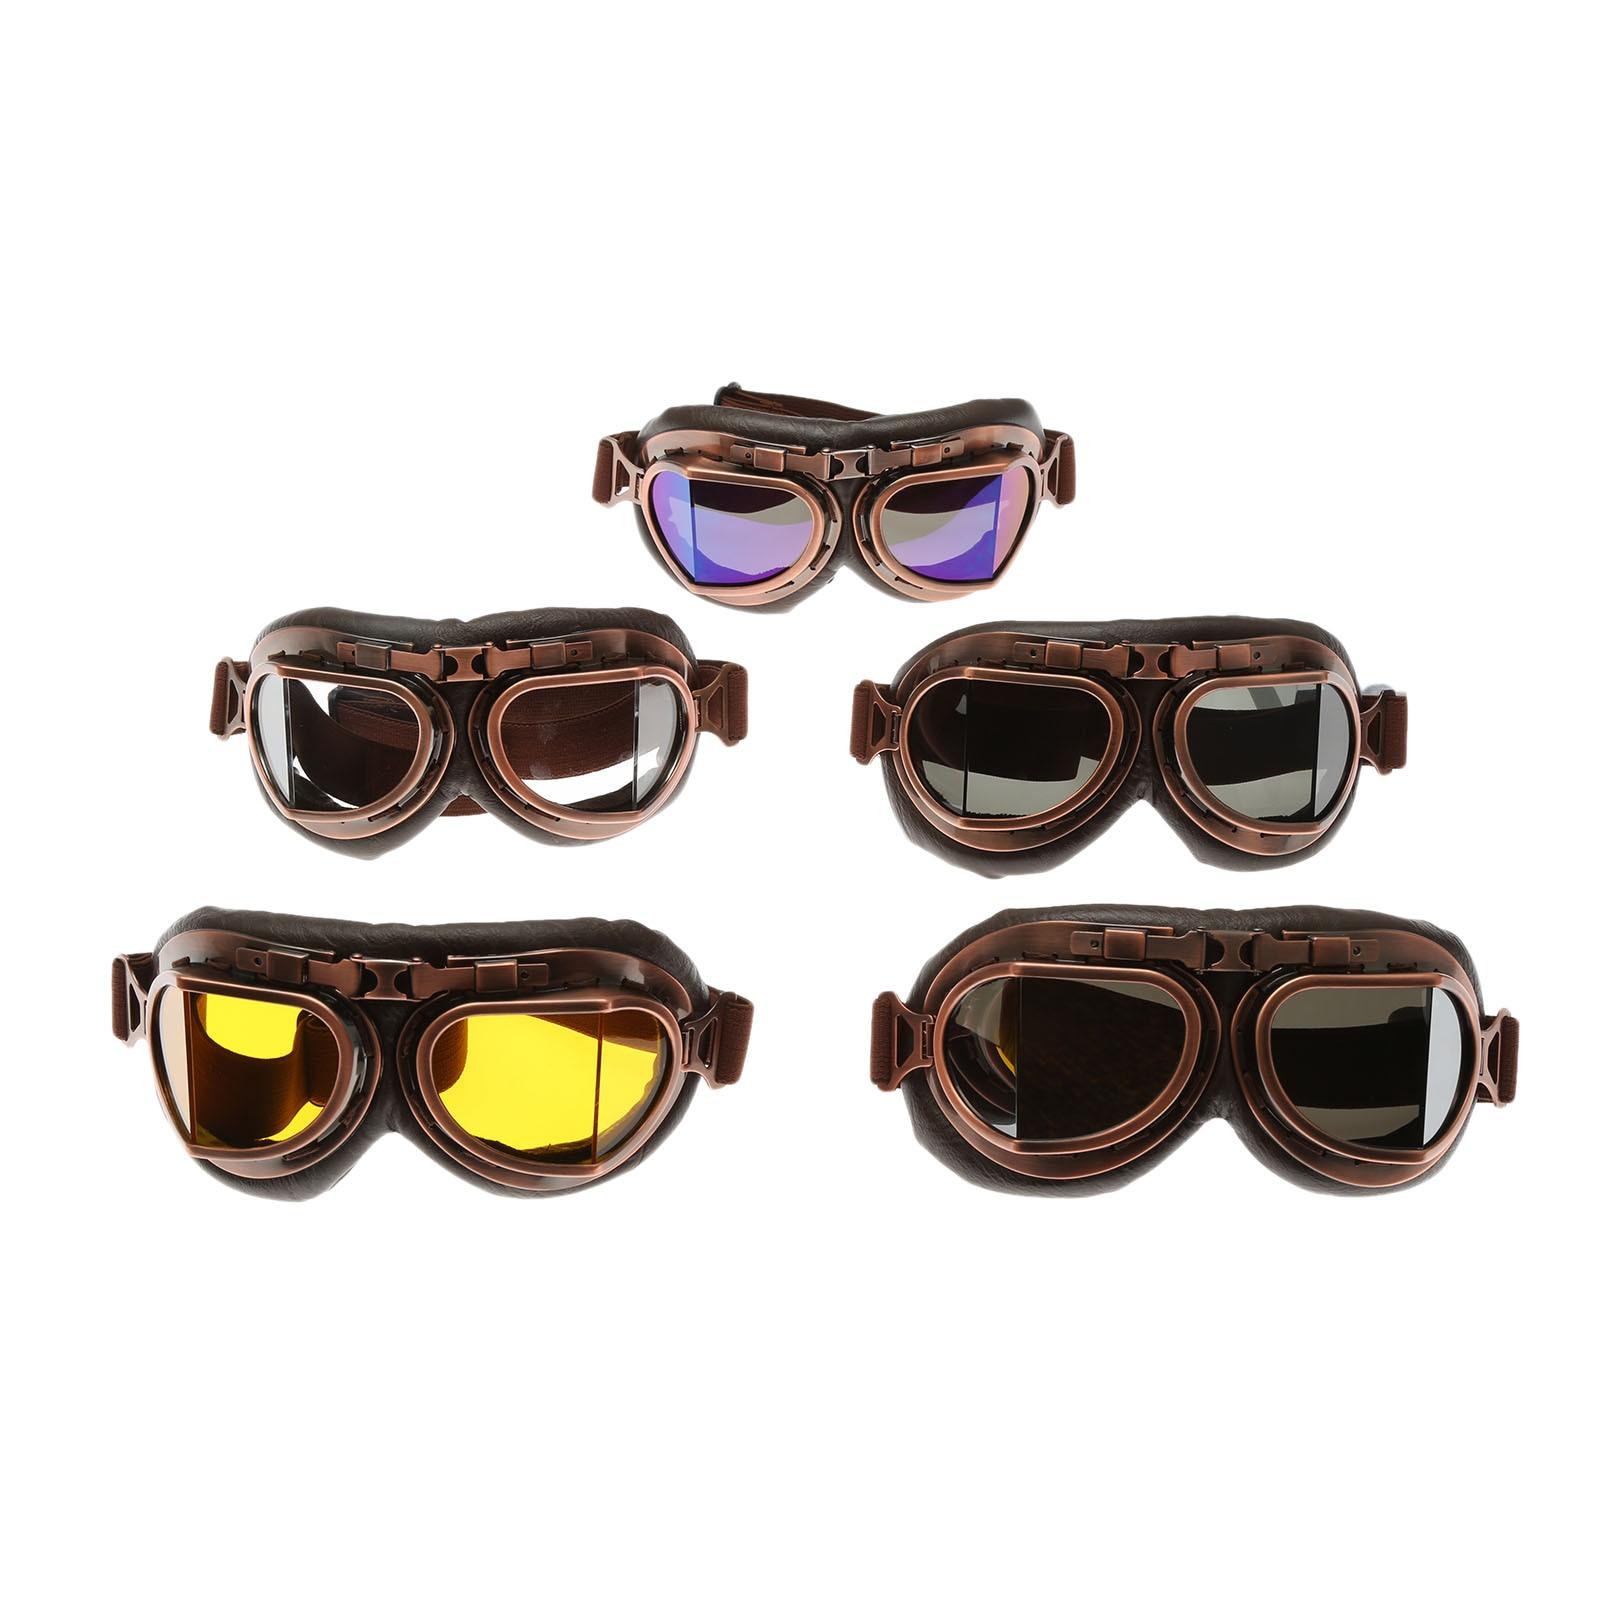 2019 nuevas gafas retro para motocicleta gafas Vintage Moto gafas clásicas para piloto Steampunk ATV bicicleta casco de cobre